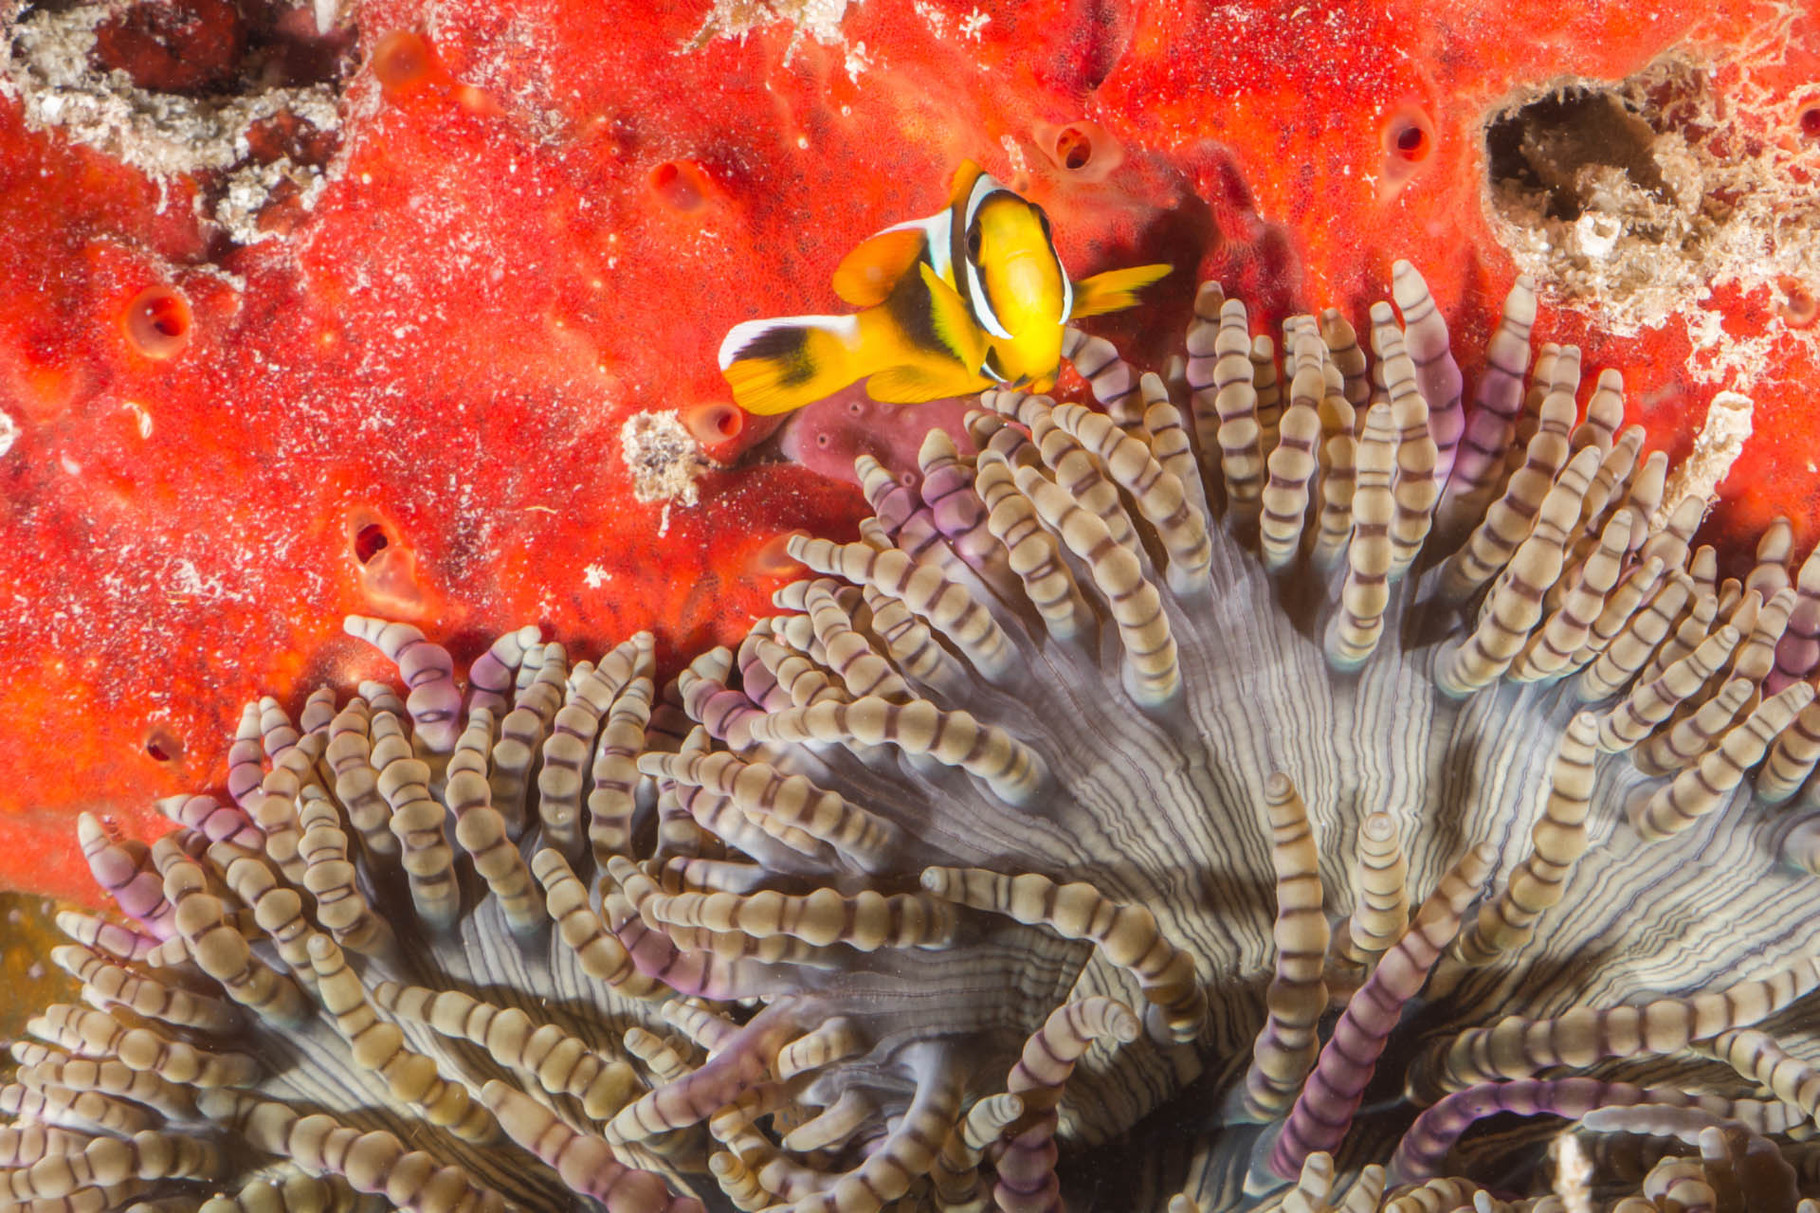 Anemone, sponge and nemo